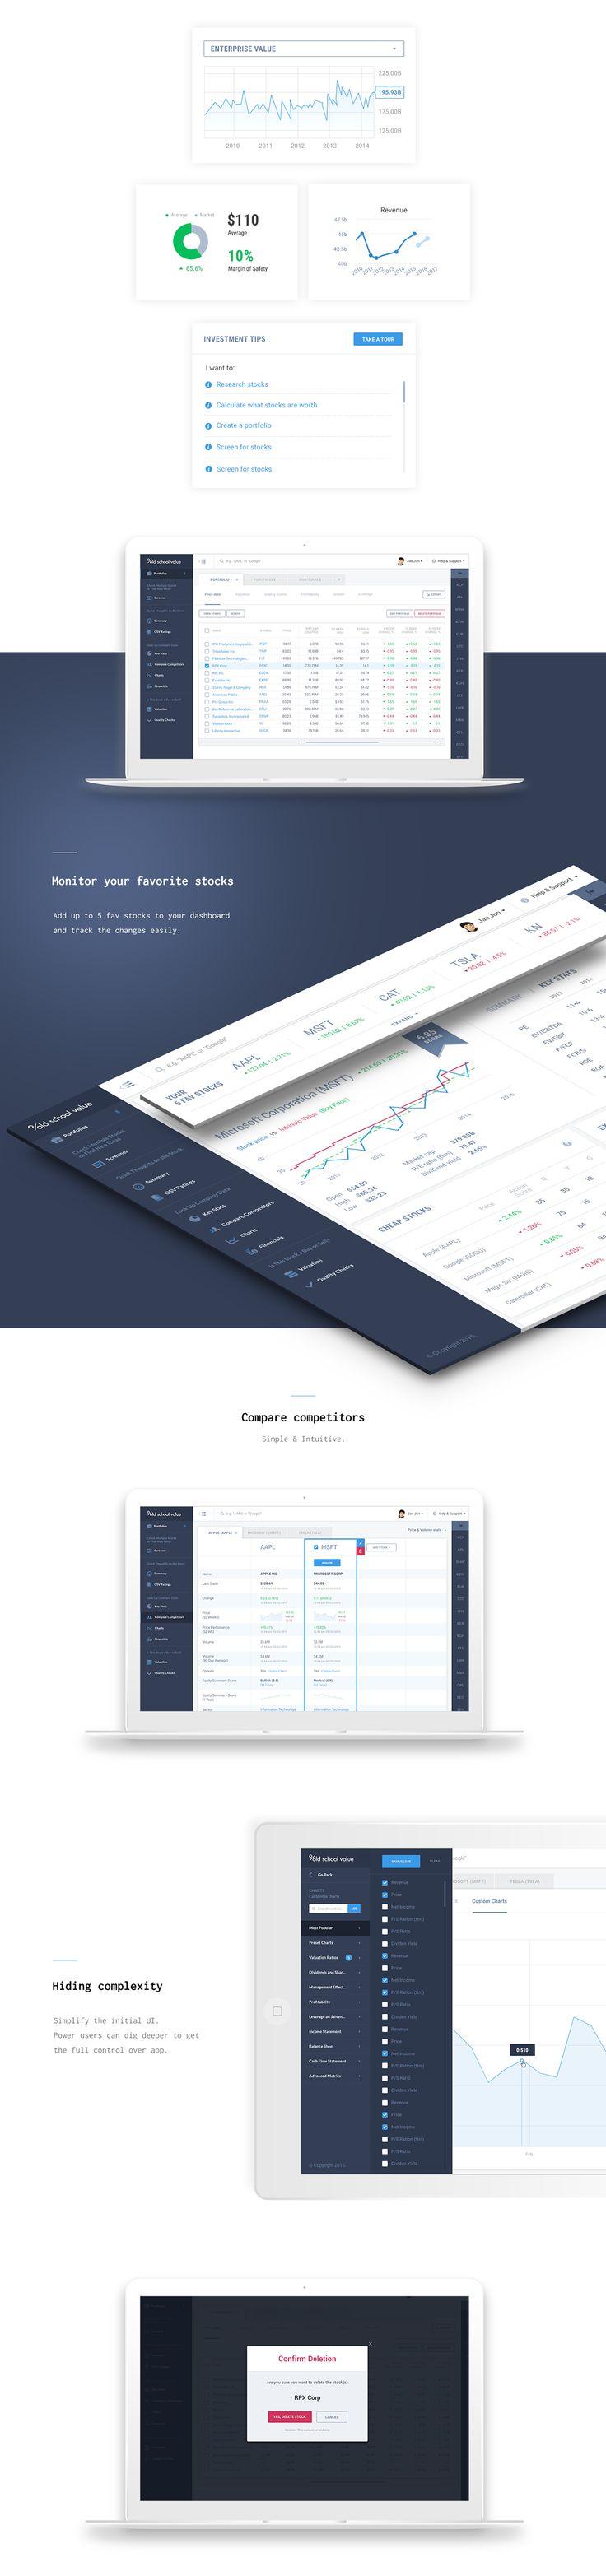 Stock Analysis Web App on Behance